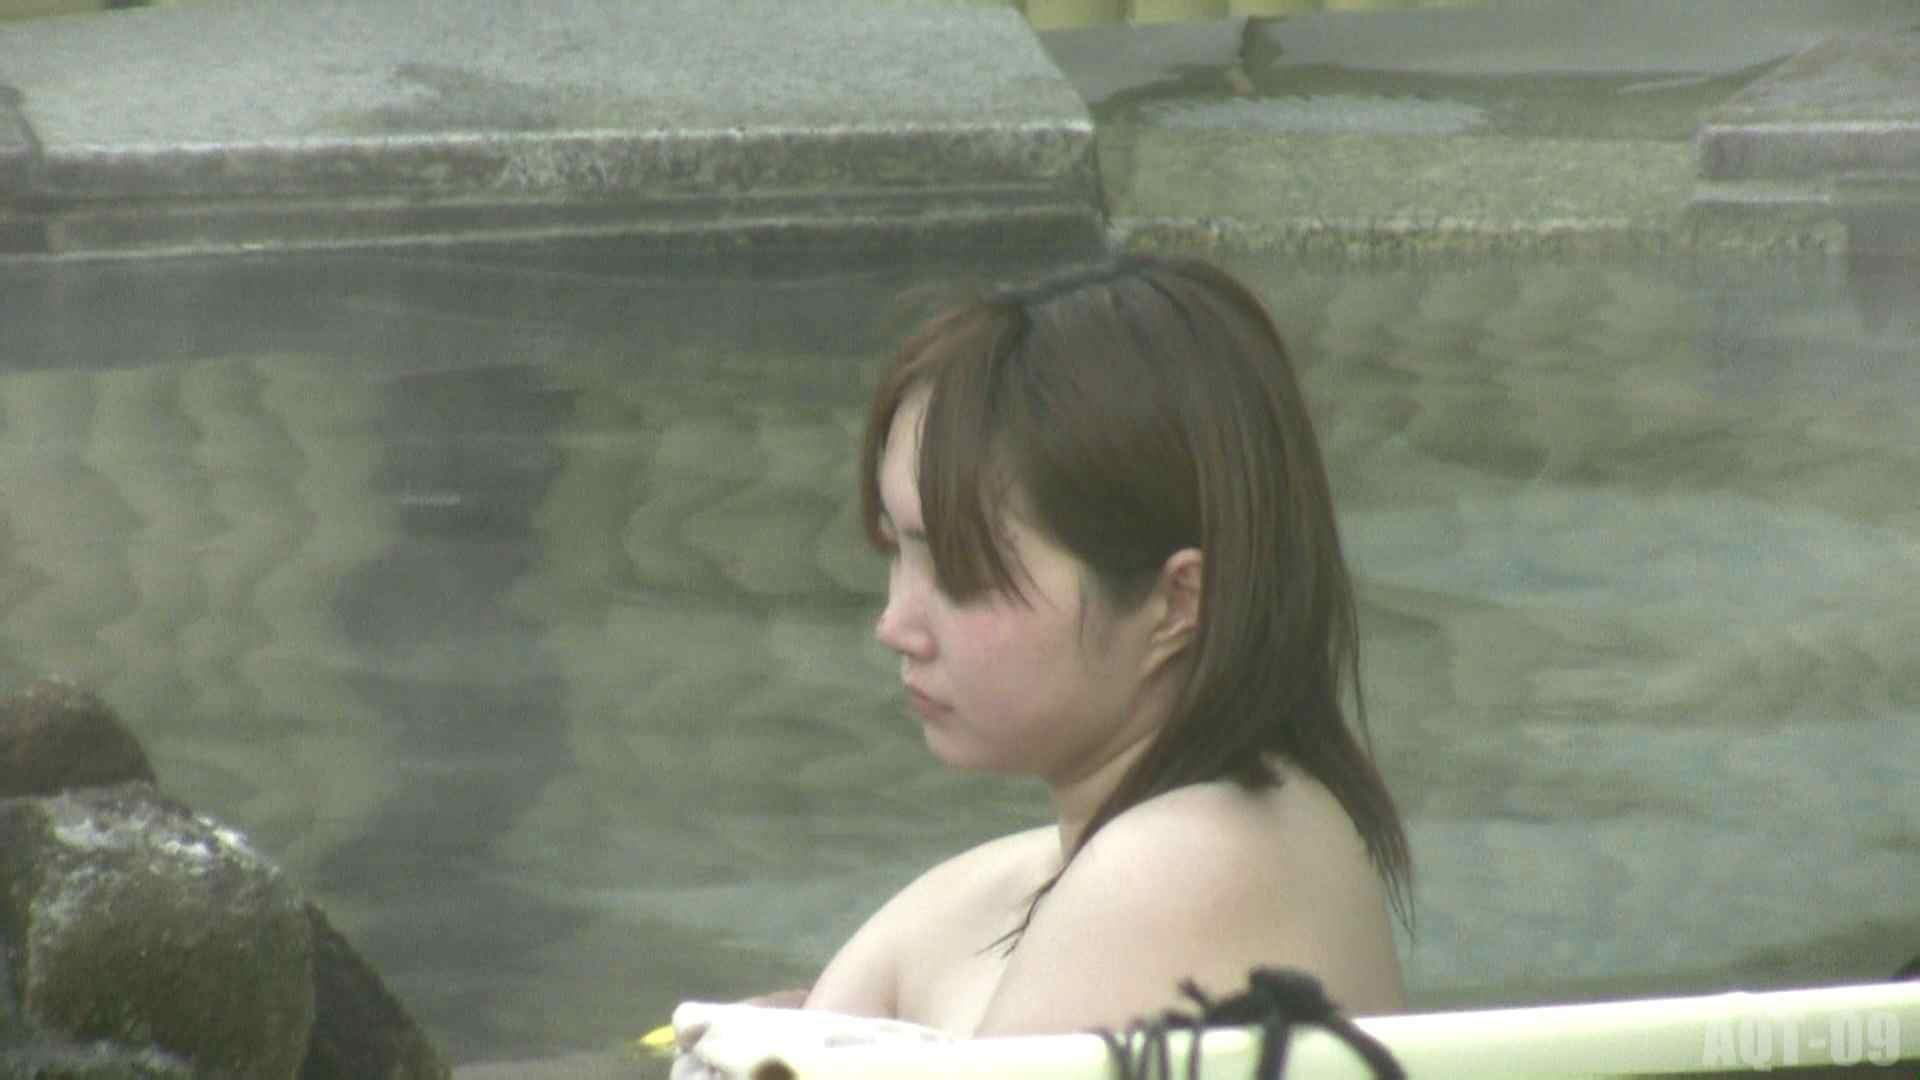 Aquaな露天風呂Vol.781 盗撮 濡れ場動画紹介 93連発 44